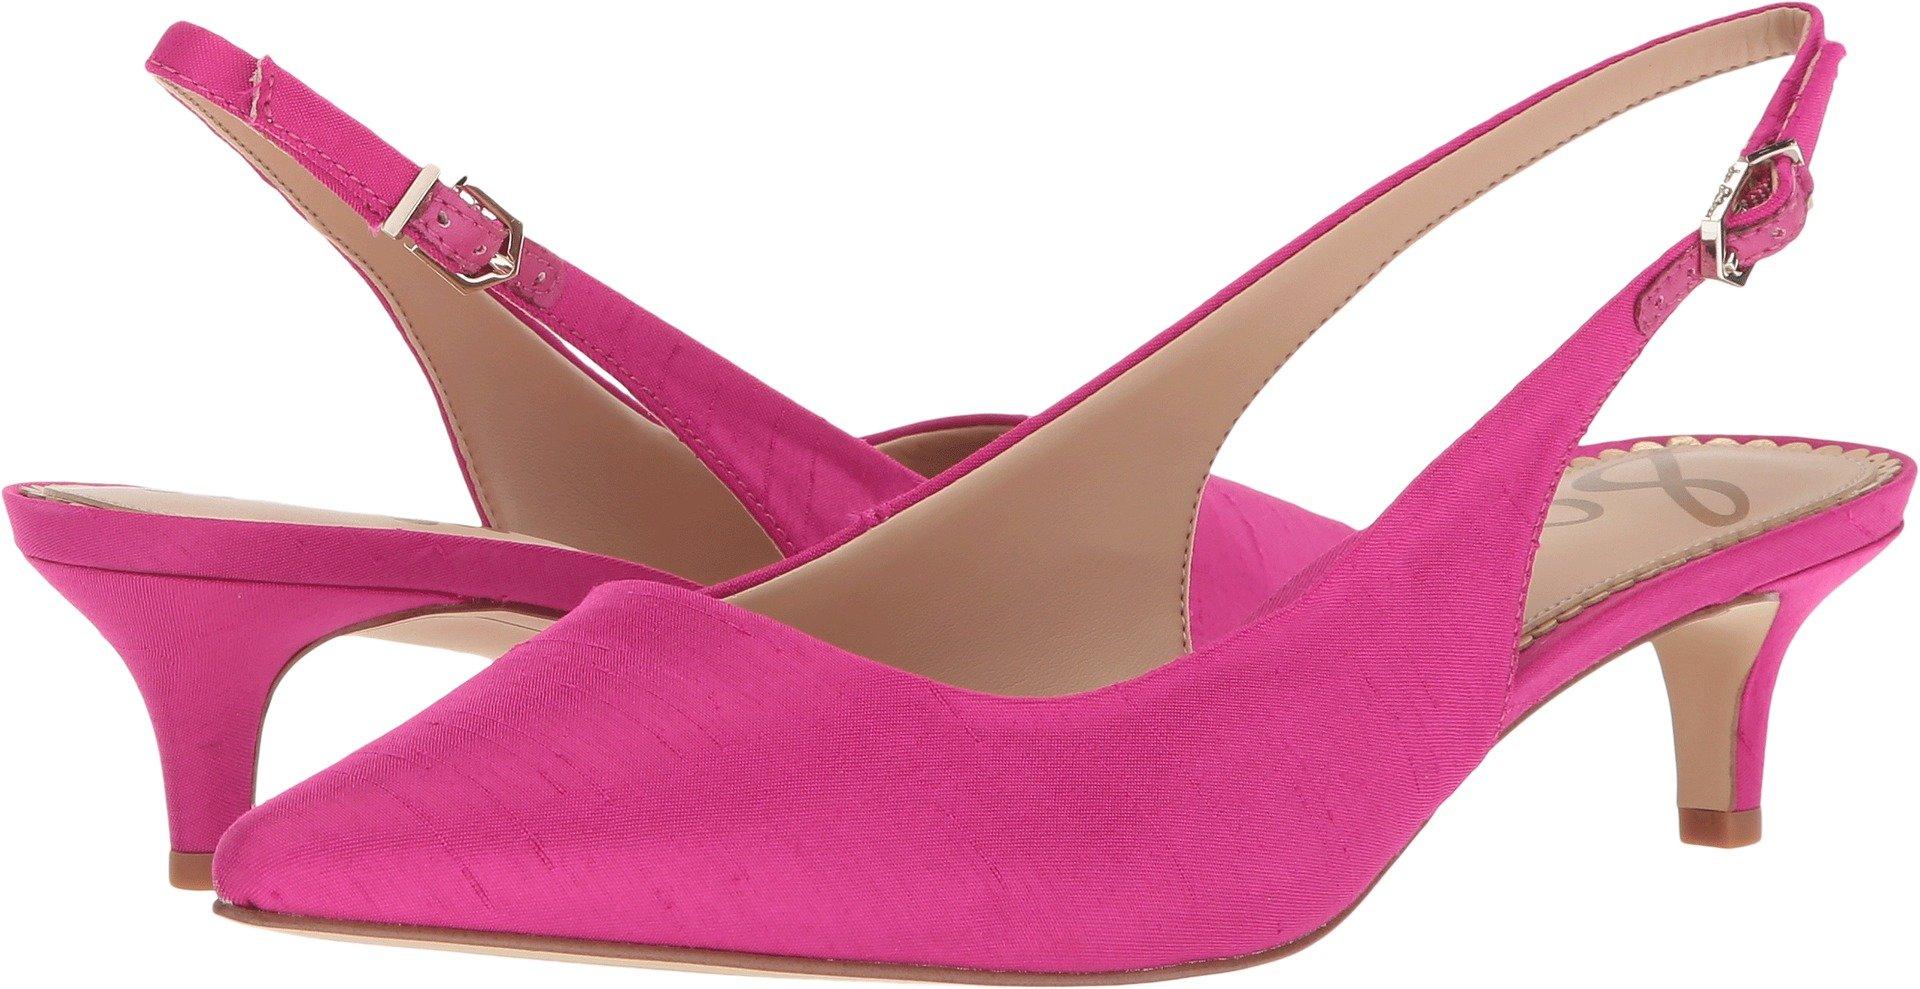 Sam Edelman Women's Ludlow Pump, Pink Magenta, 8 Medium US